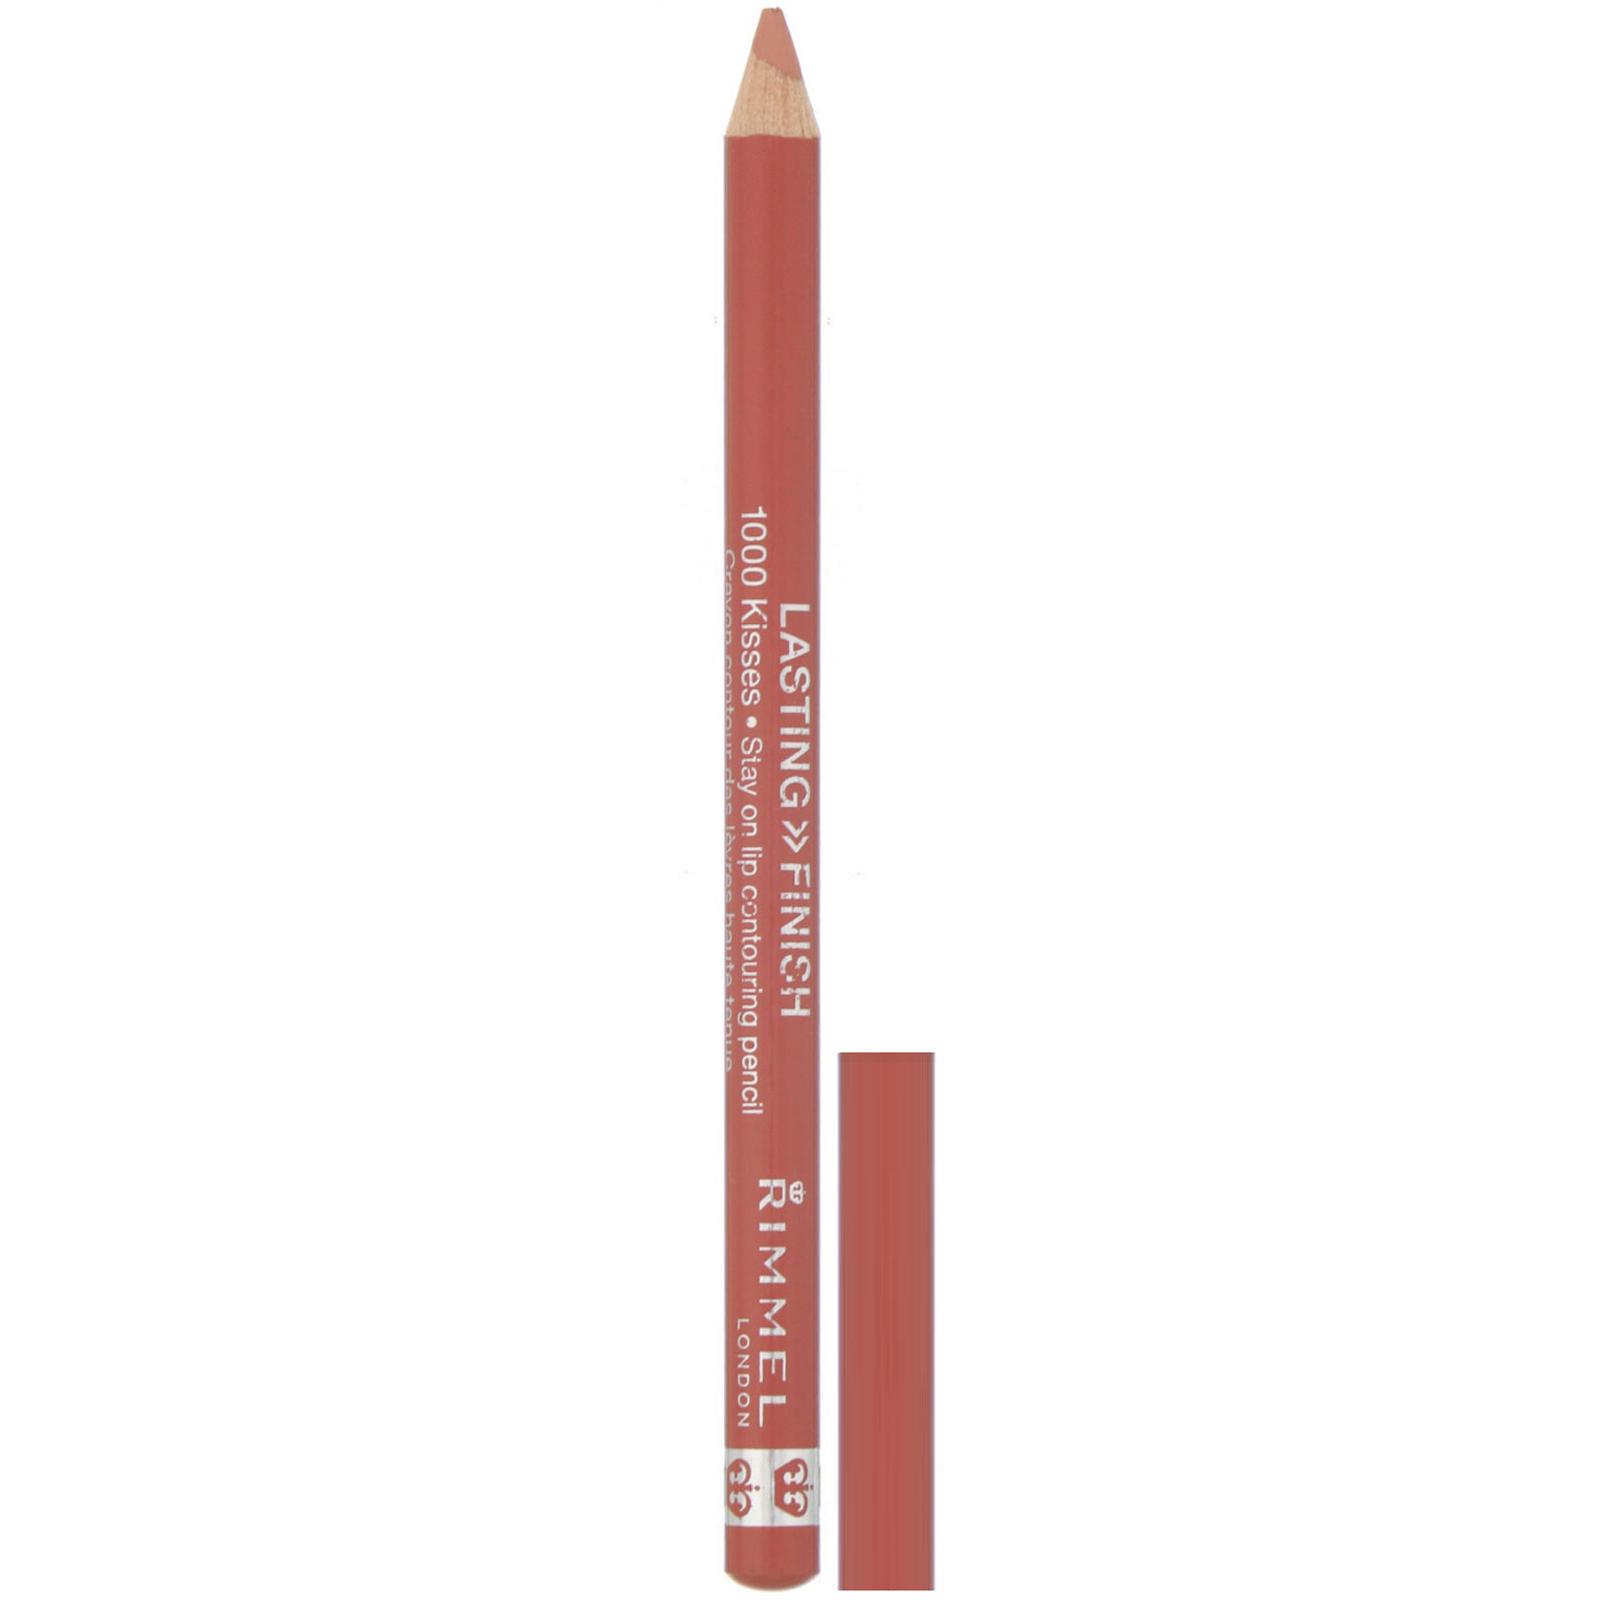 Rimmel London, Lasting Finish, 1000 Kisses Stay On, контурный карандаш для губ, оттенок 080 «Румяный нюд», 1,2 г